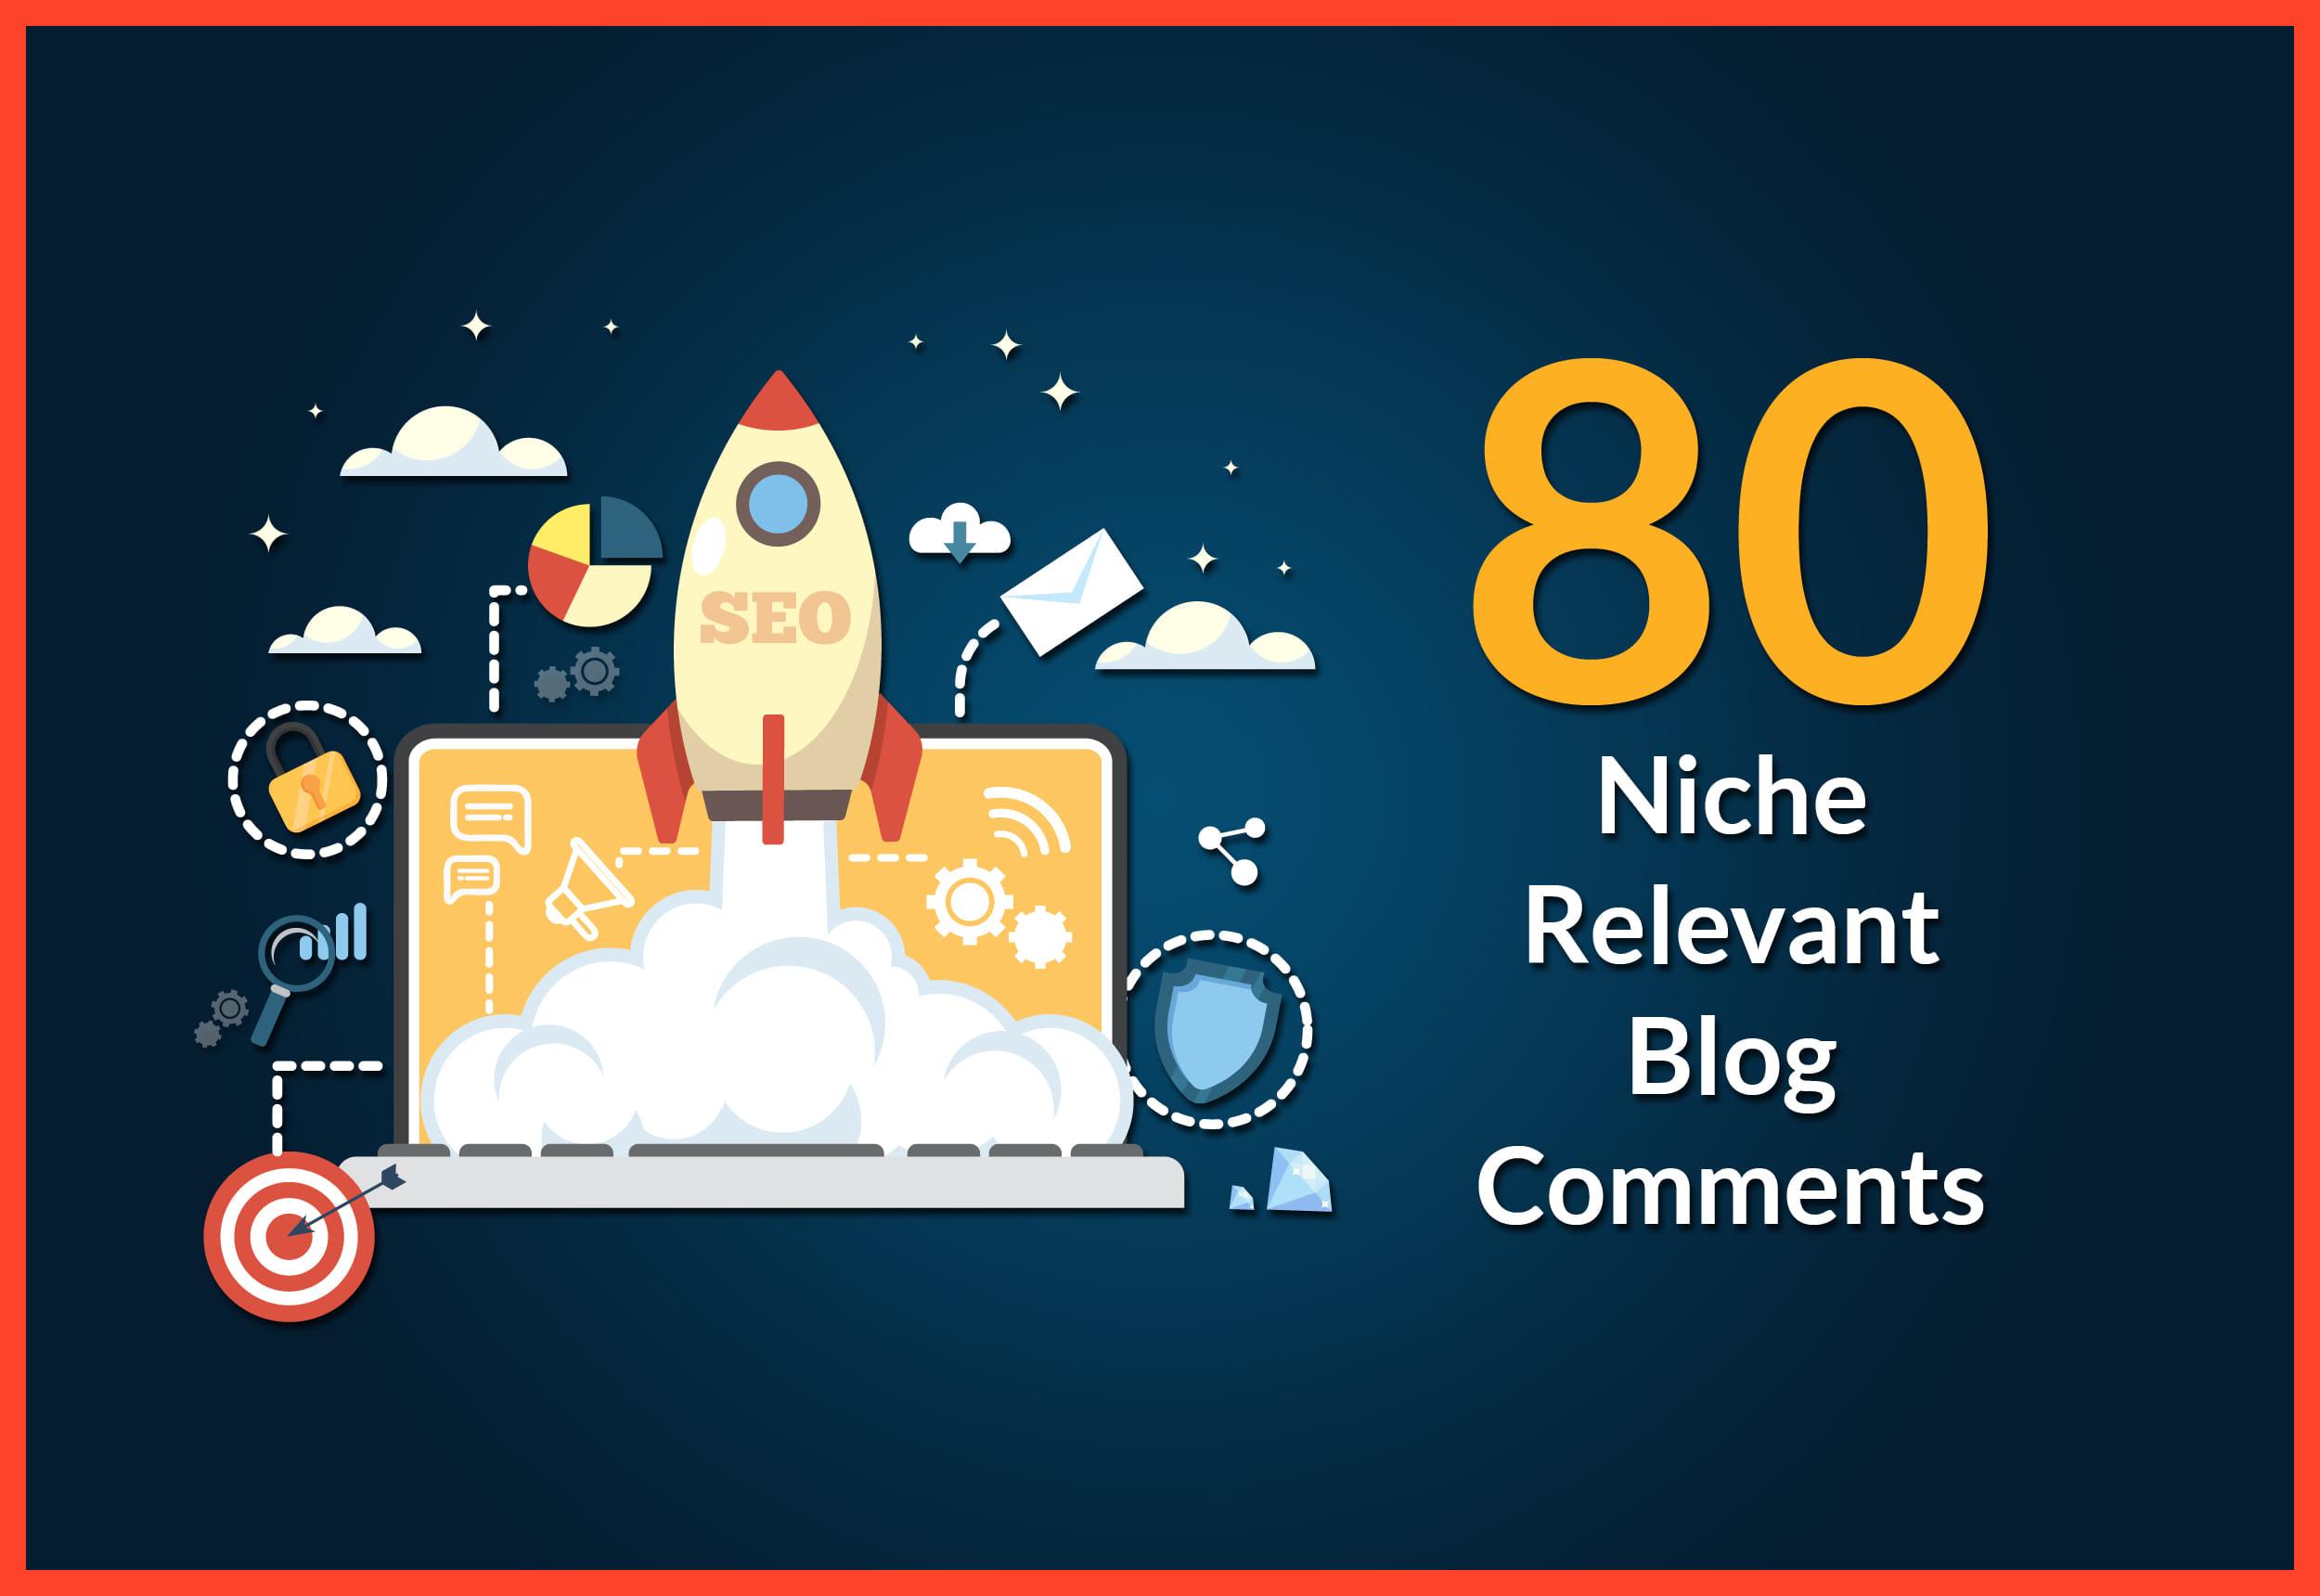 Do 80 Niche Relavant Blog Comments Backlinks